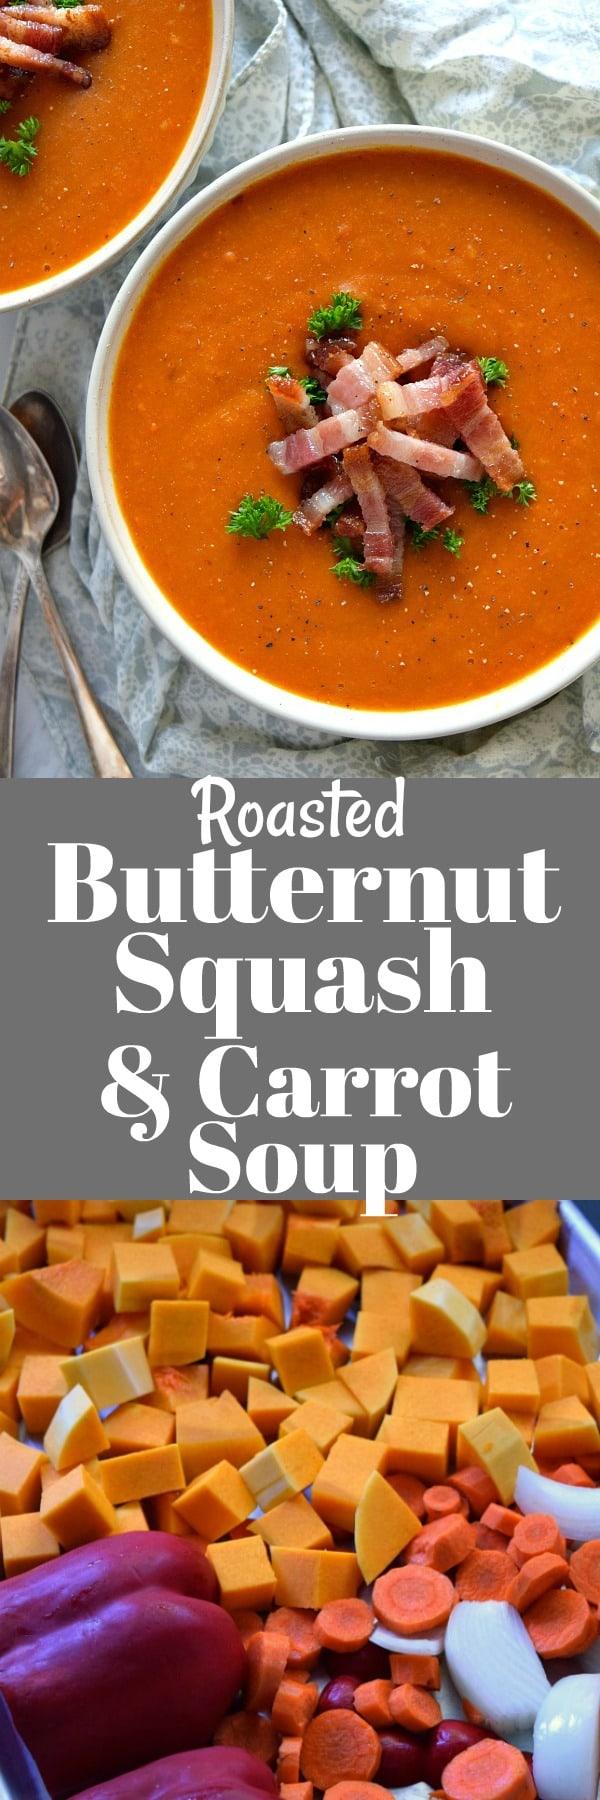 Roasted Butternut Squash & Carrot Soup Pinterest Pin #soup #butternutsquash